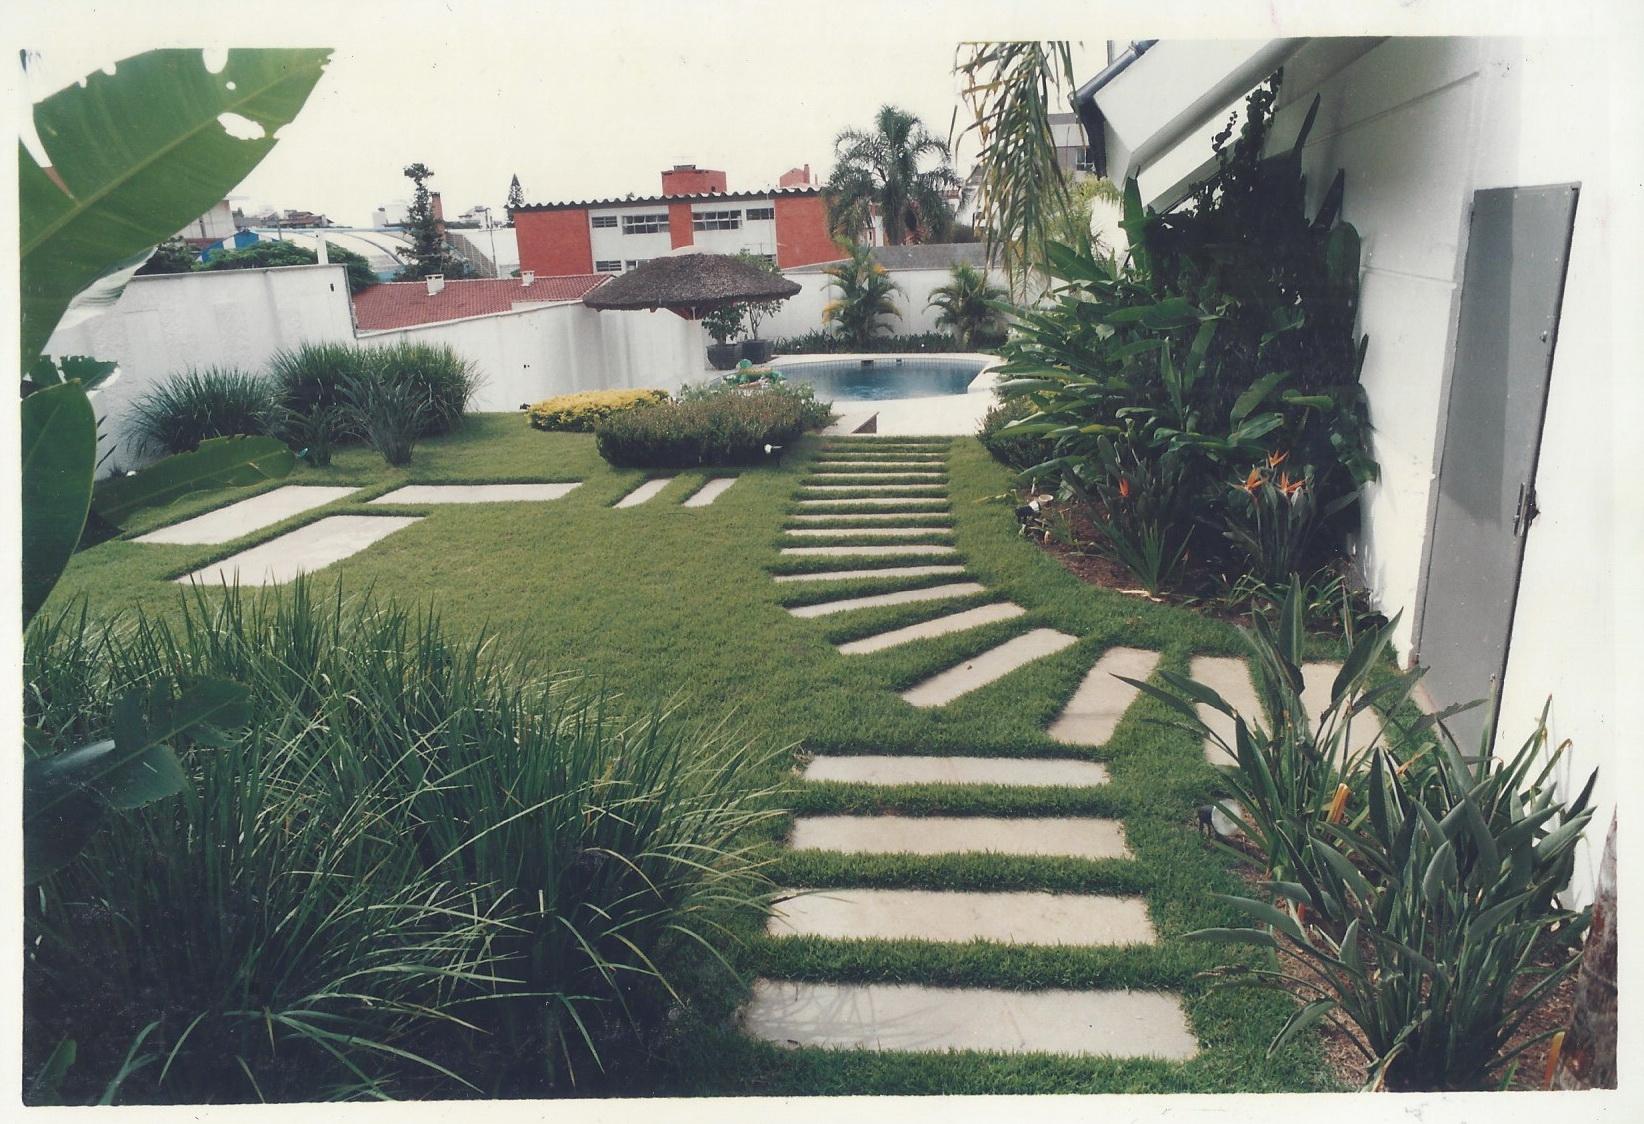 jardim-residencial-com-arq-helena-karpouzas-7-foto-eneida-serrano